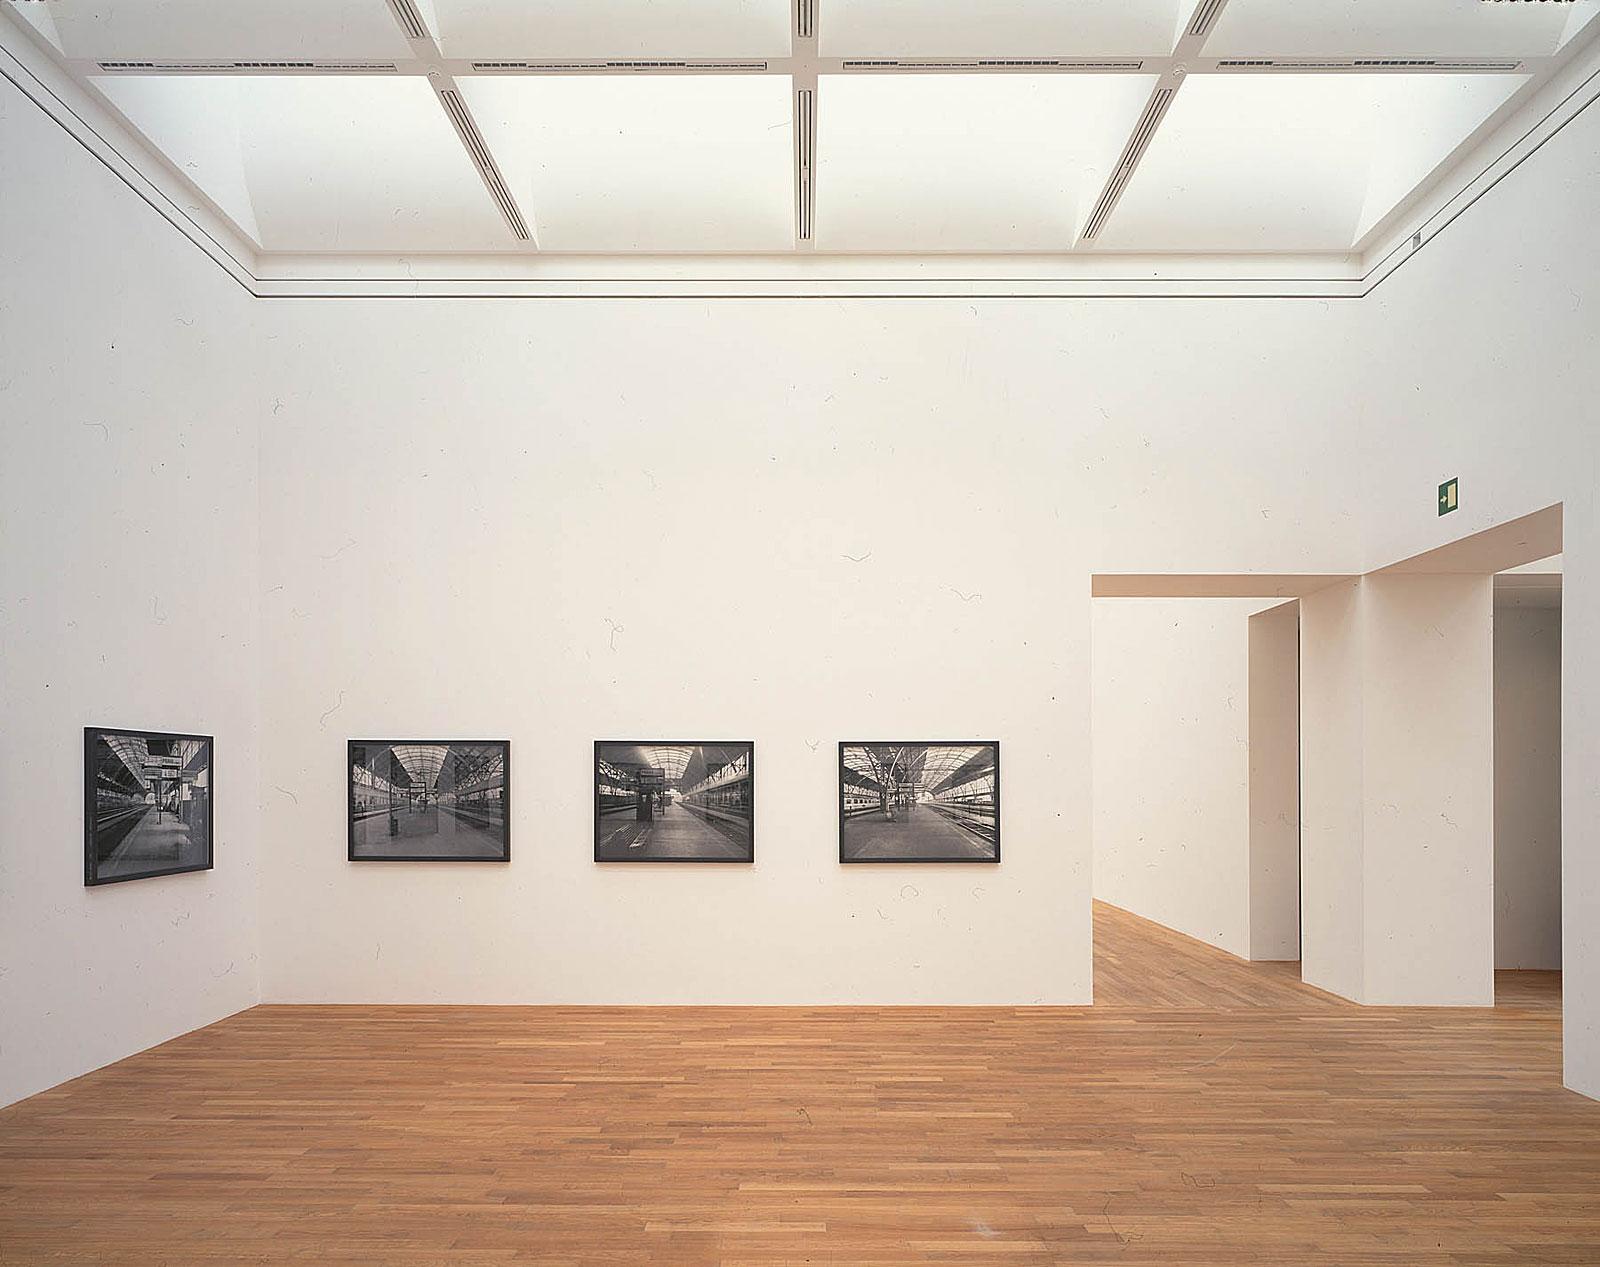 Reisezeit, Dorothea von Stetten Kunstpreis, Kunstmuseum Bonn